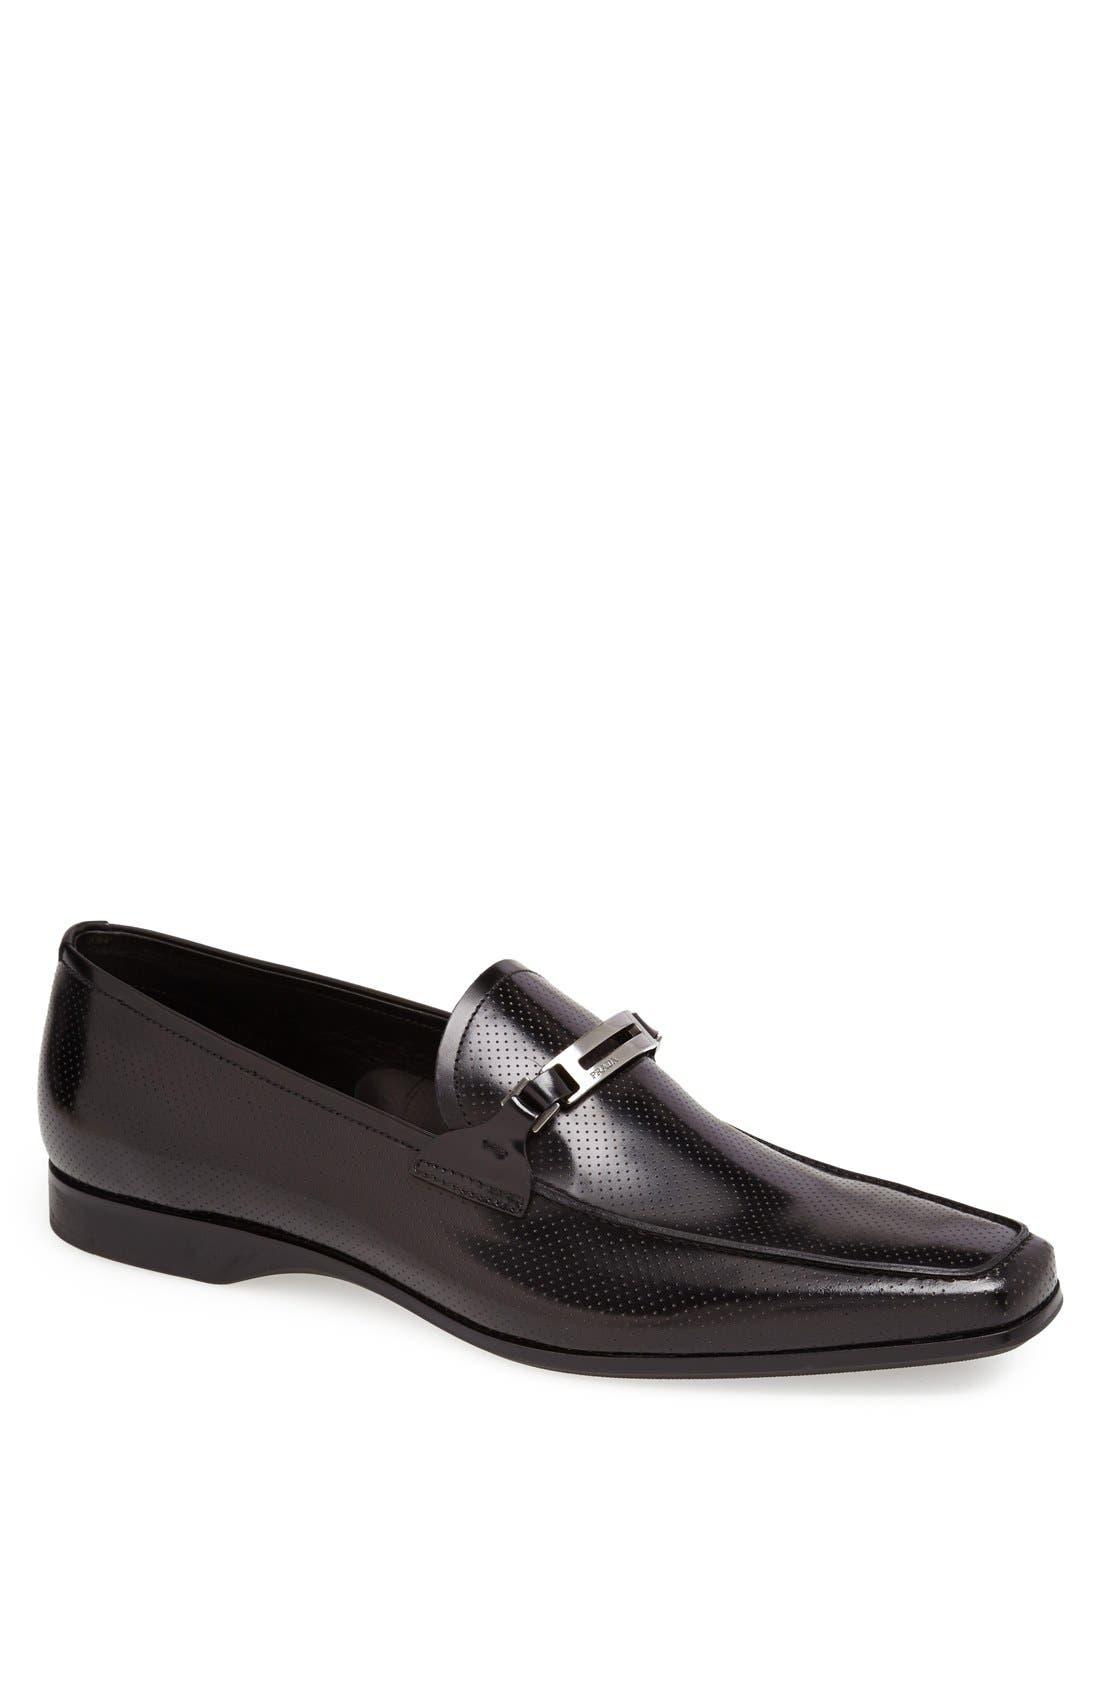 Main Image - Prada Leather Bit Loafer